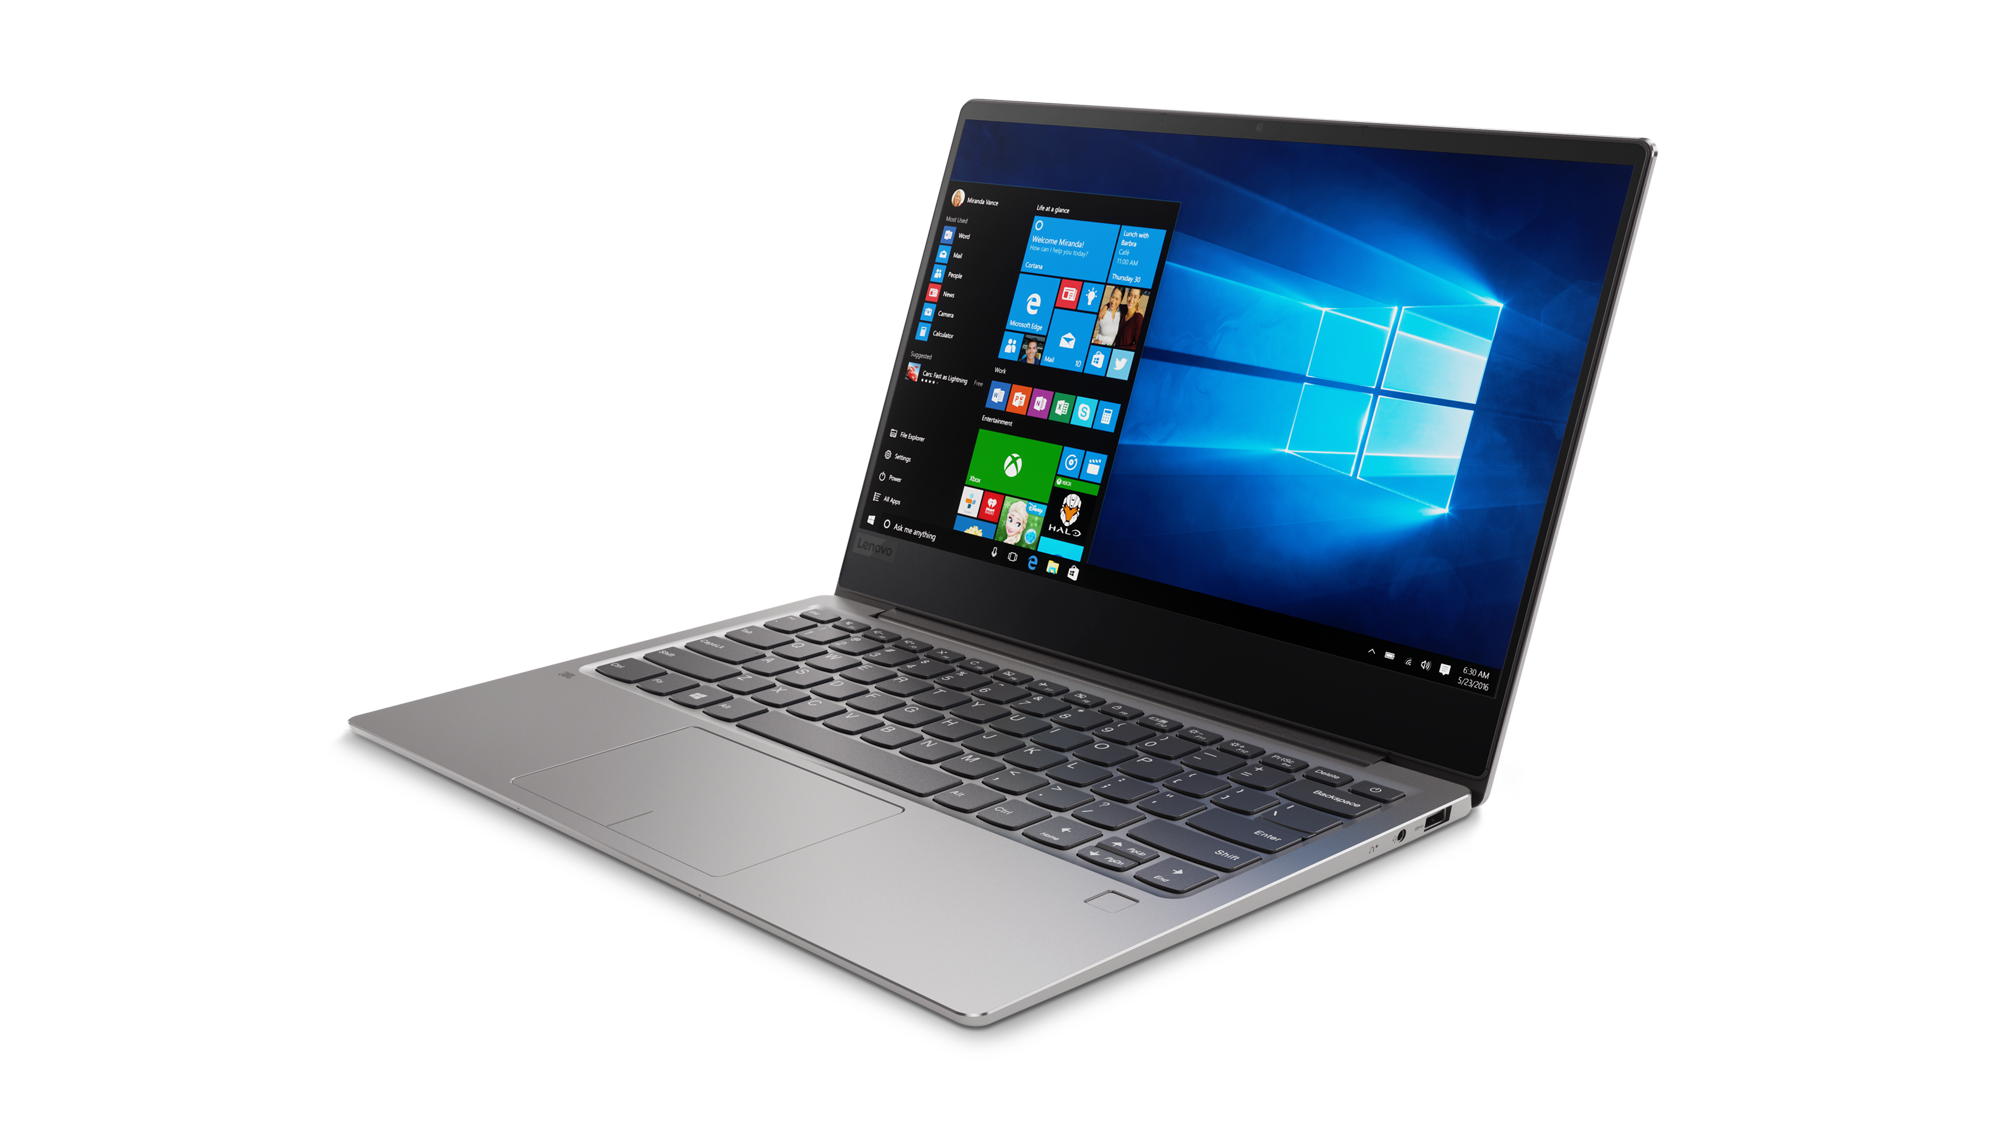 "Lenovo IdeaPad 720S-13IKB i5-7200U 3,10GHz/8GB/SSD 256GB/13,3"" FHD/IPS/AG/FPR/Thunderbolt 3/WIN10 šedá 81A8001LCK"